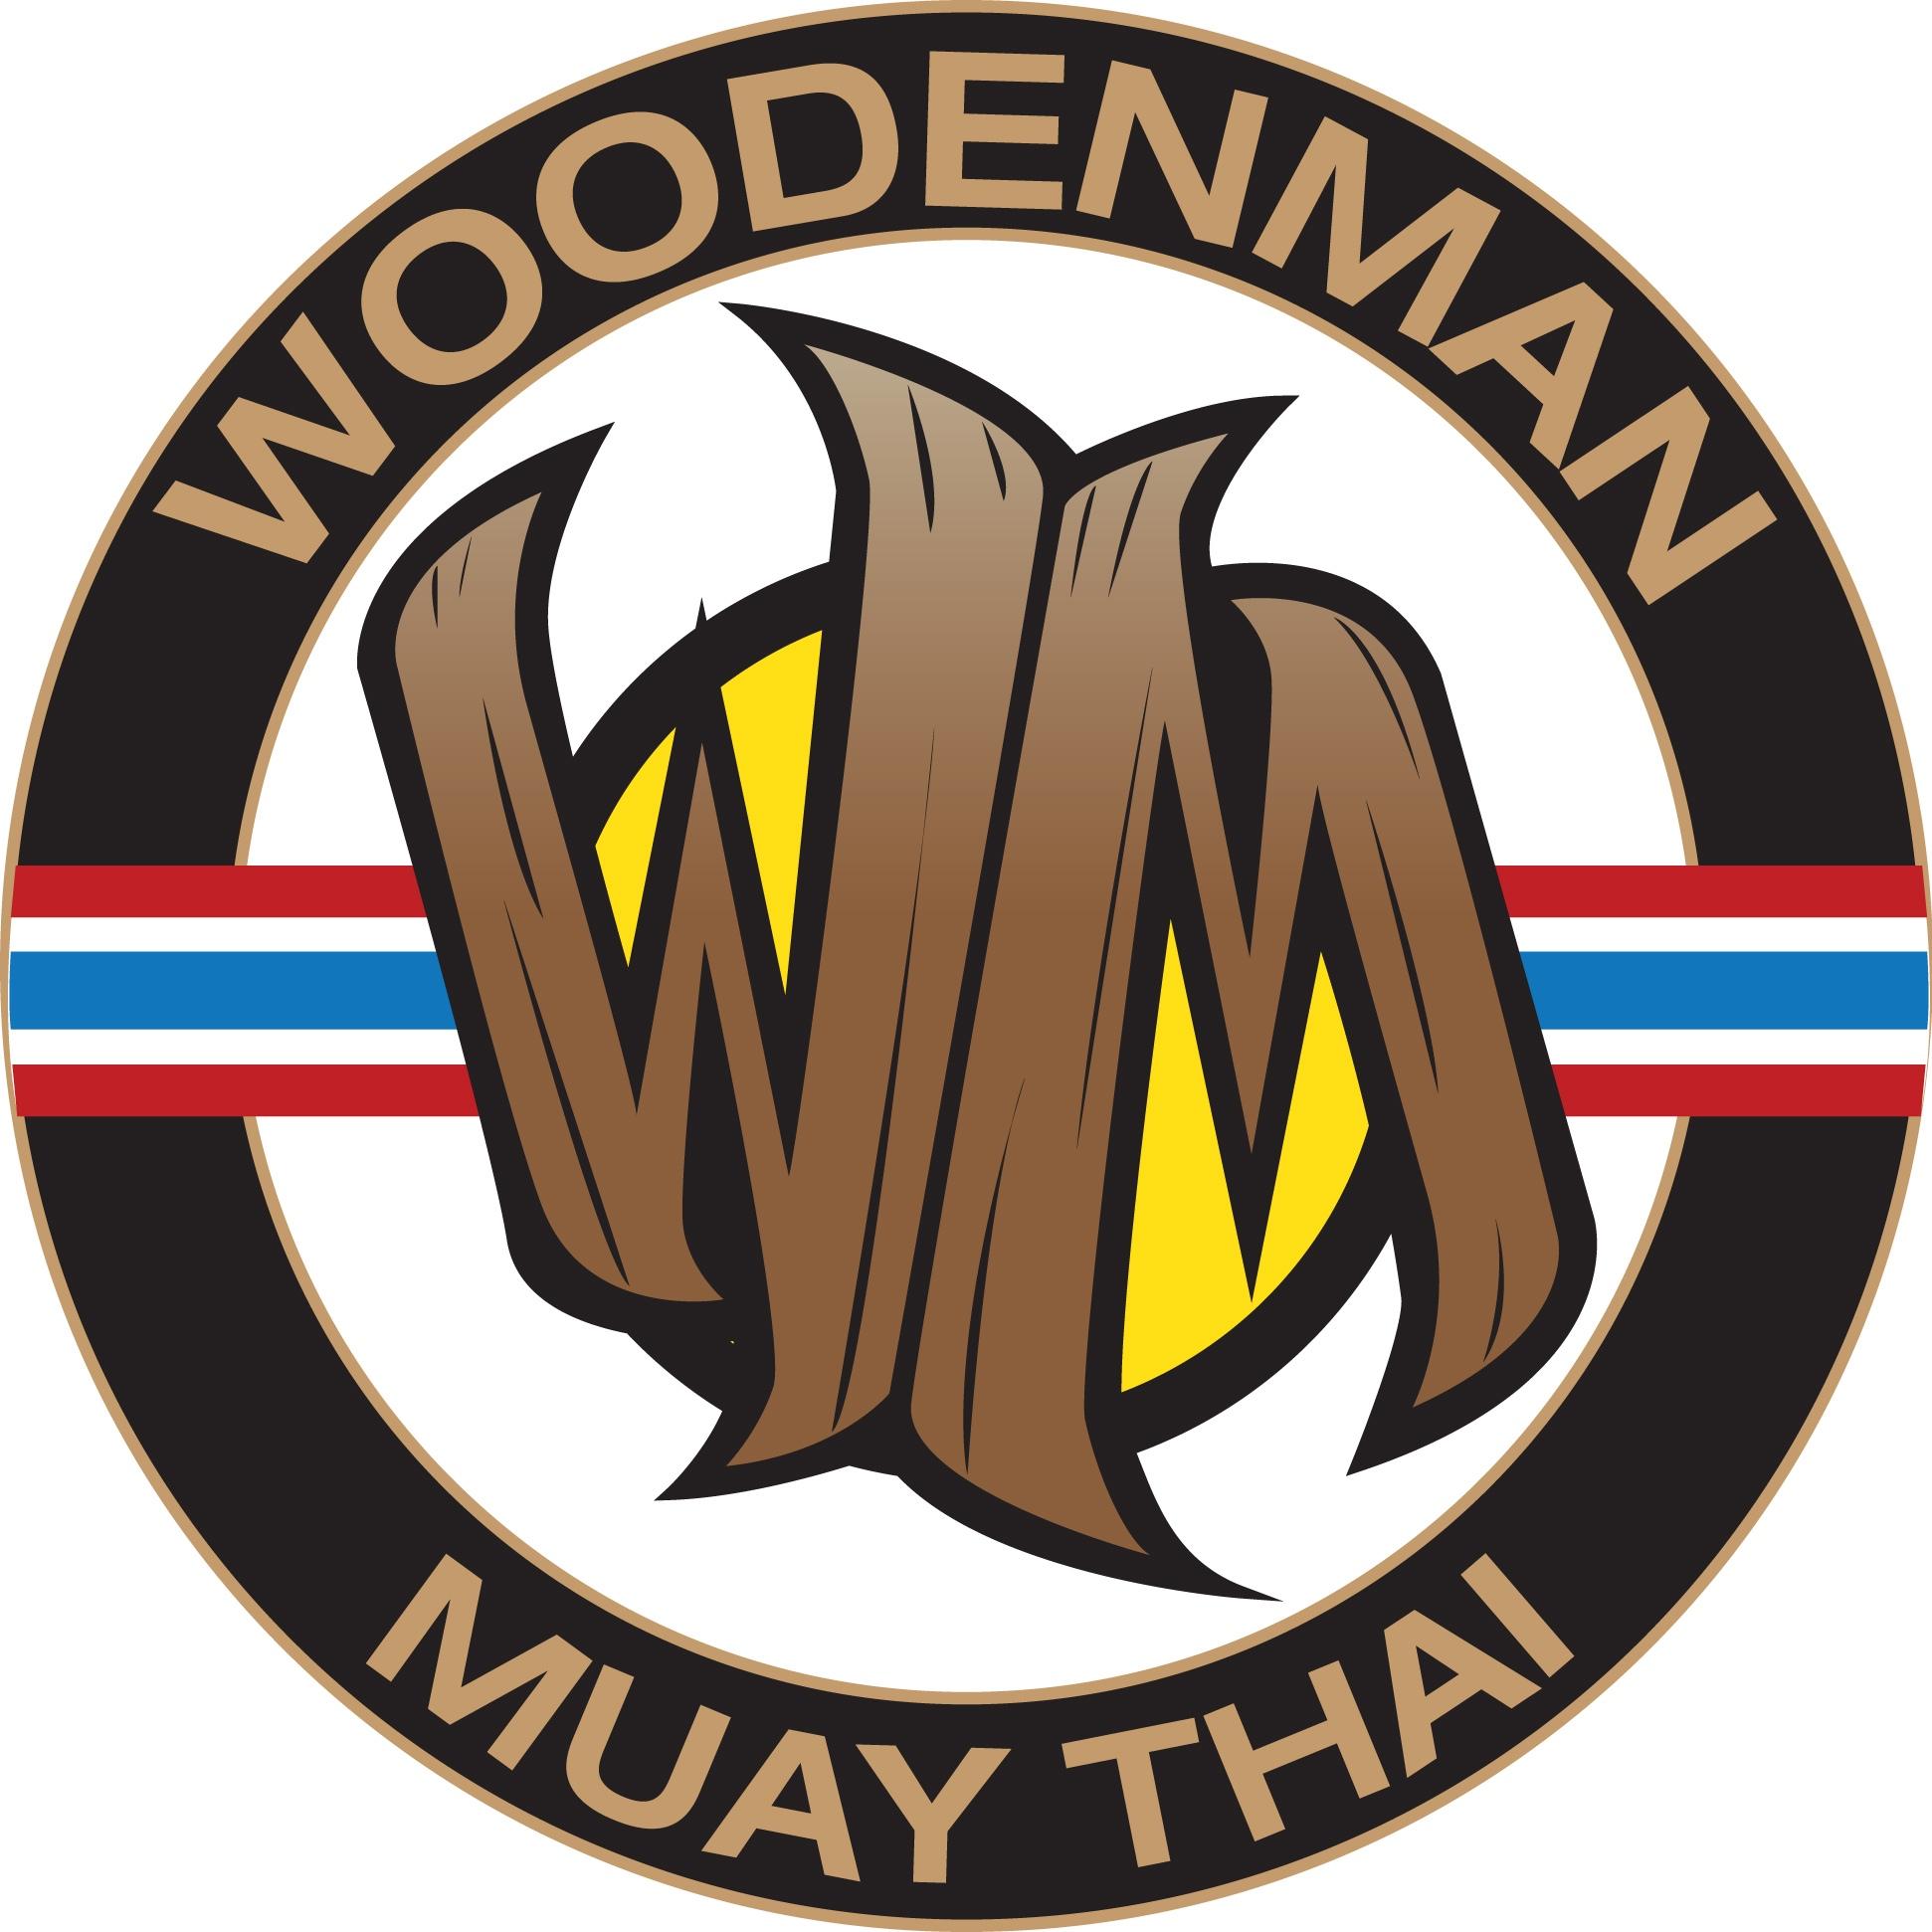 woodenman logo.jpg